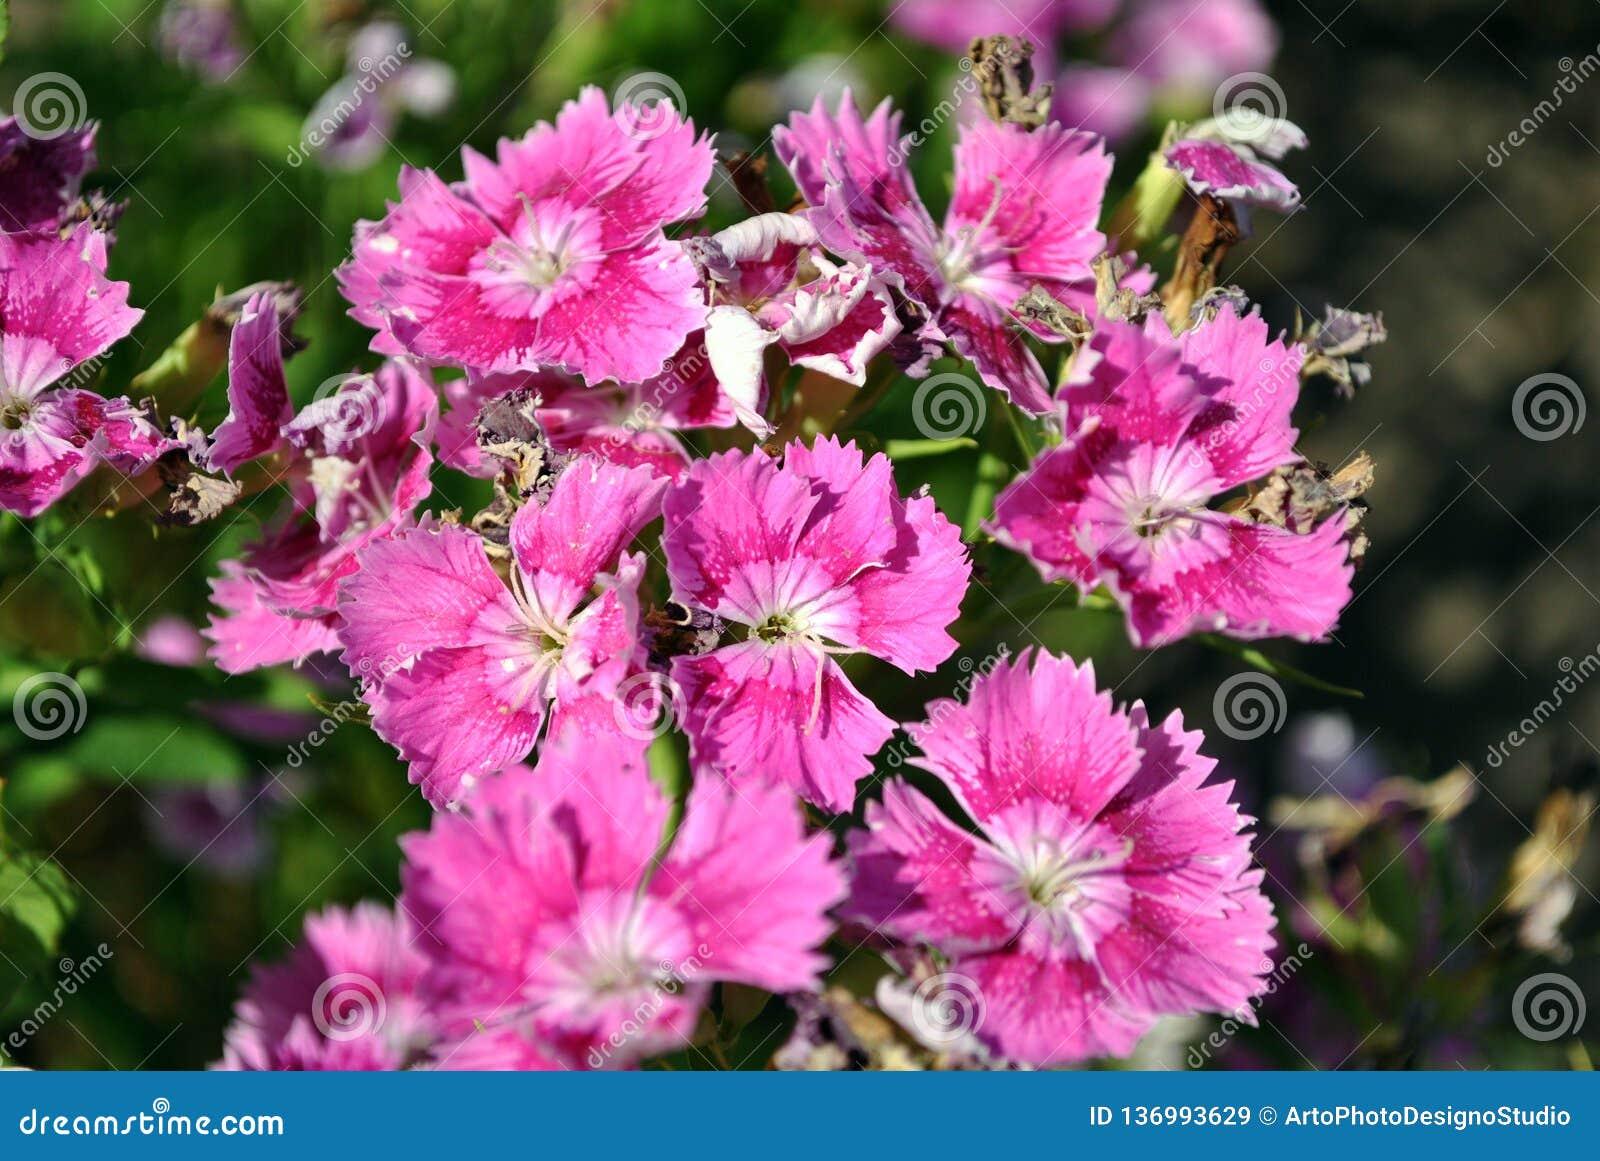 Pink dianthus barbatus Sweet William flowers blooming, top view close up macro detail, green background bokeh